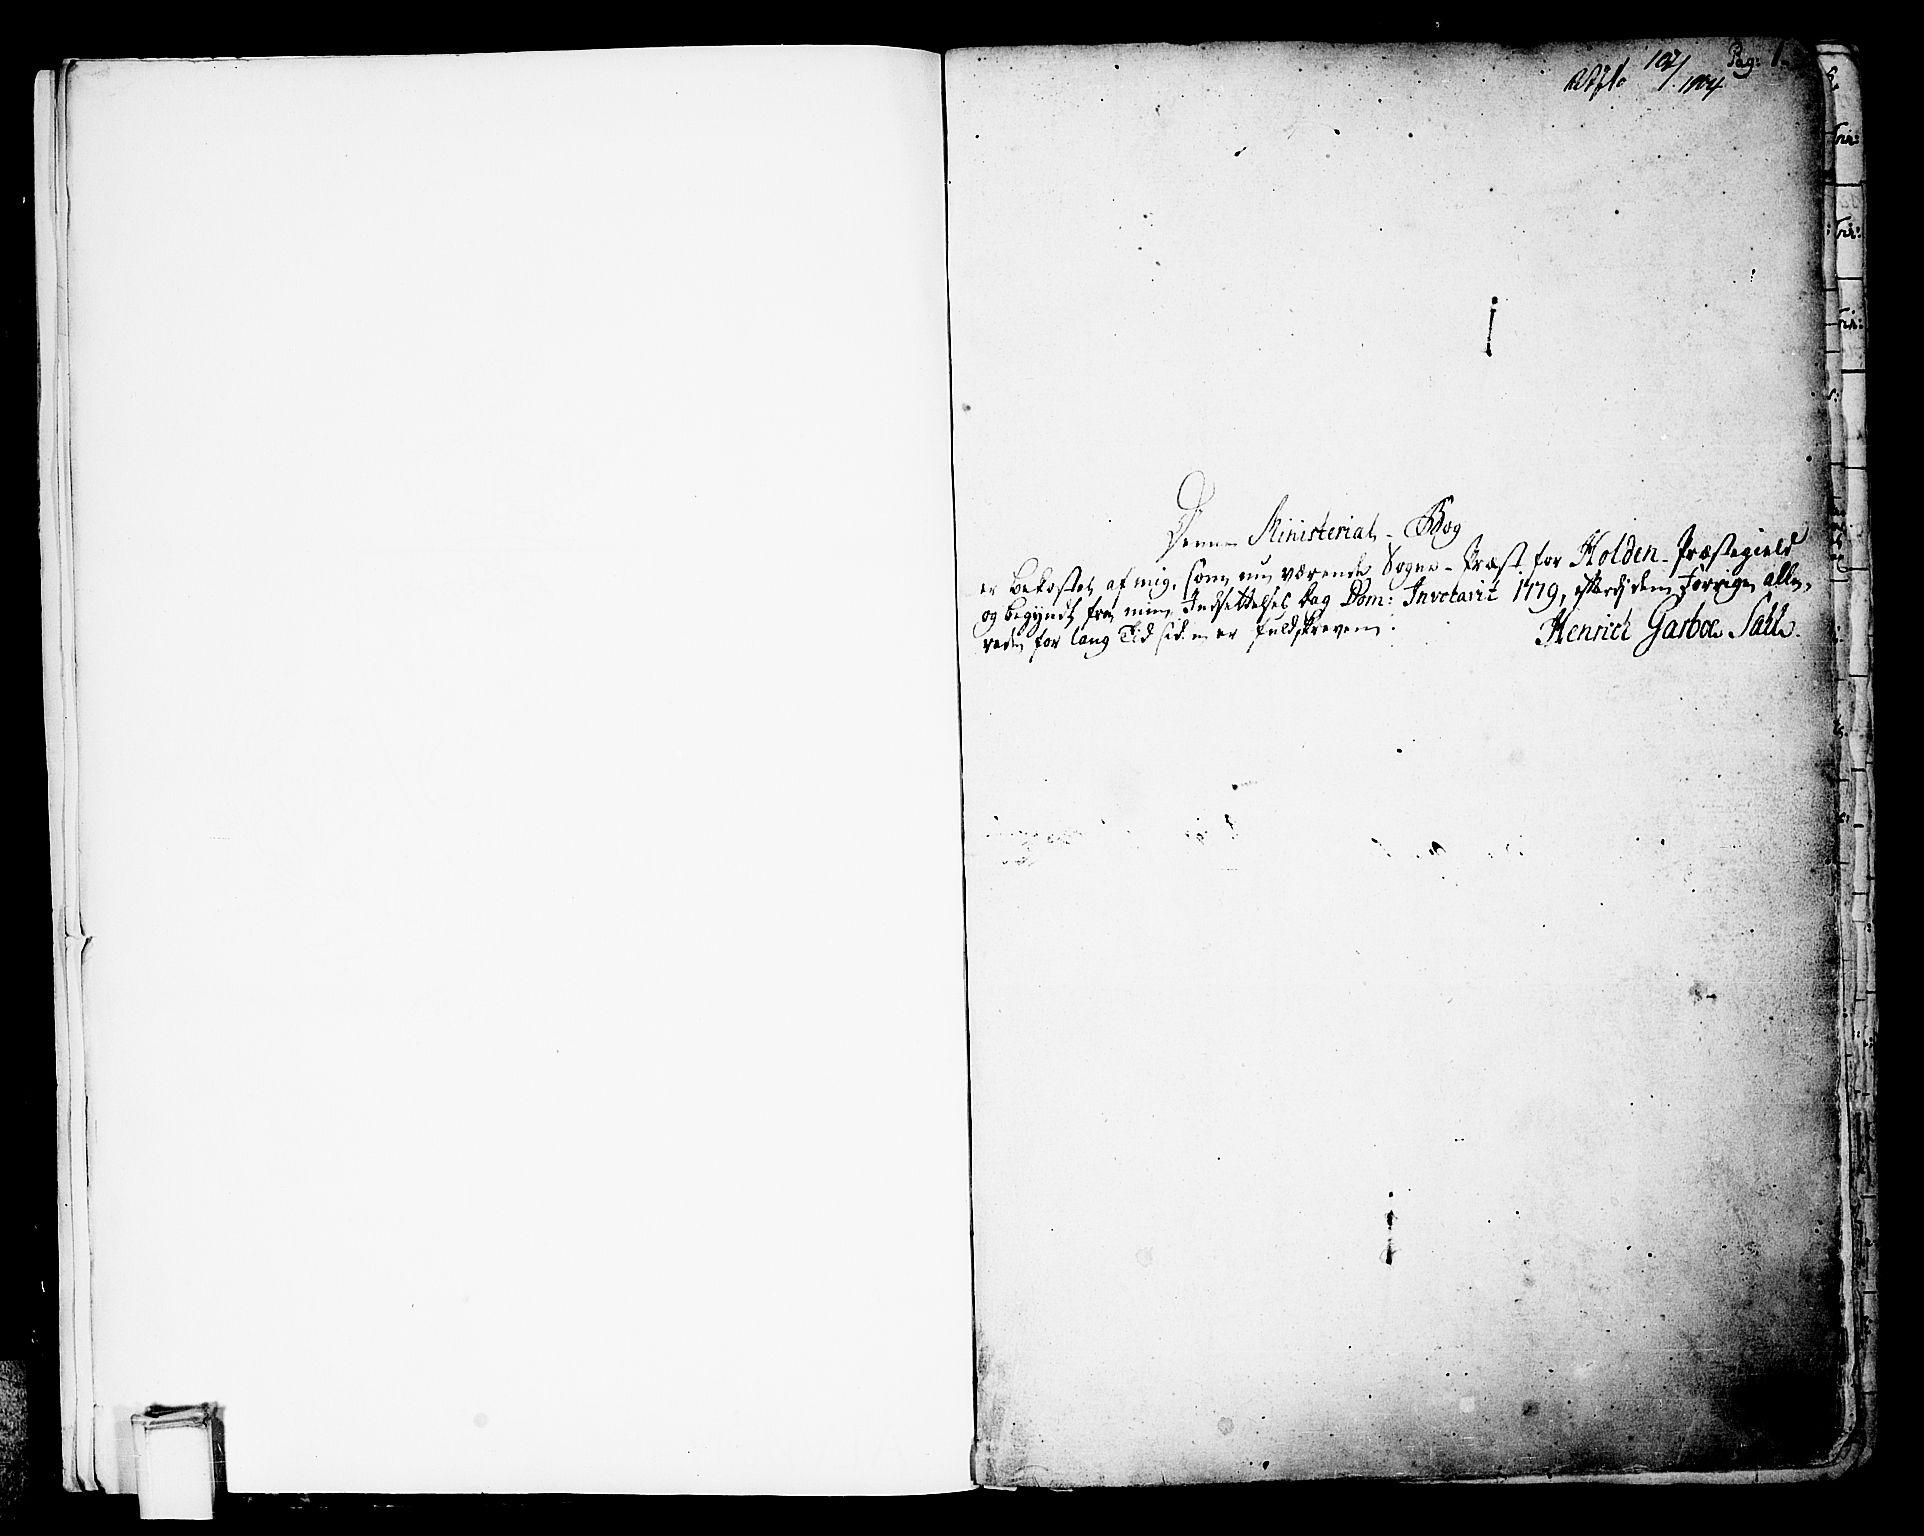 SAKO, Holla kirkebøker, F/Fa/L0002: Ministerialbok nr. 2, 1779-1814, s. 1